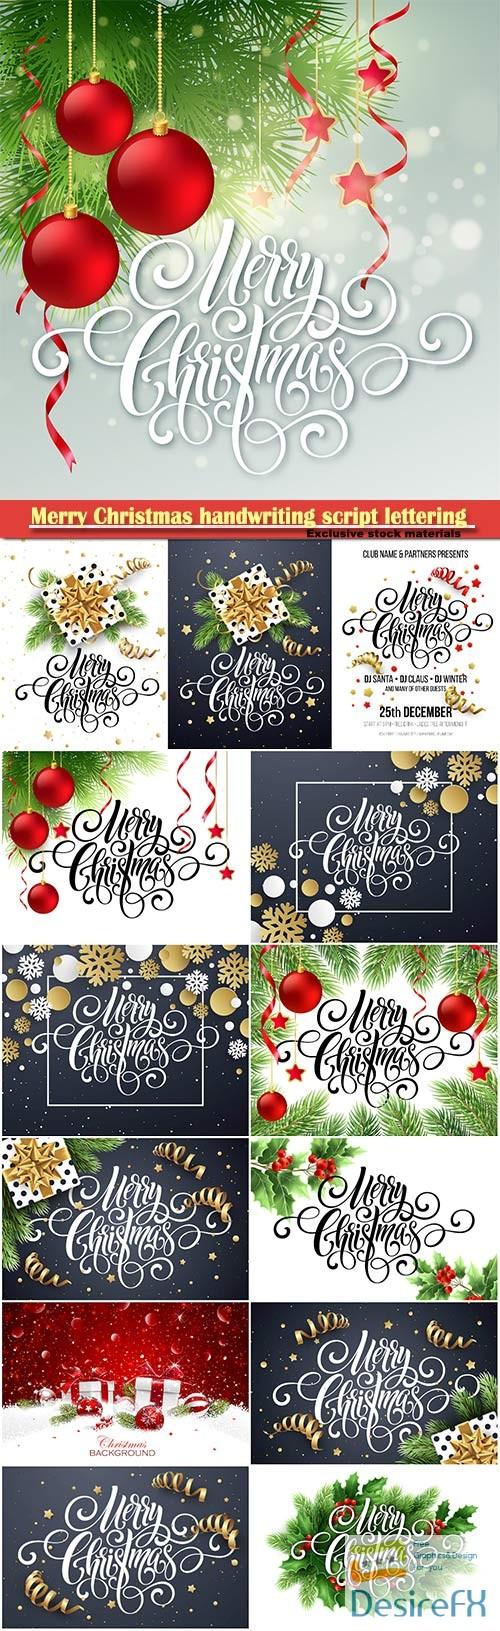 Merry Christmas handwriting script lettering